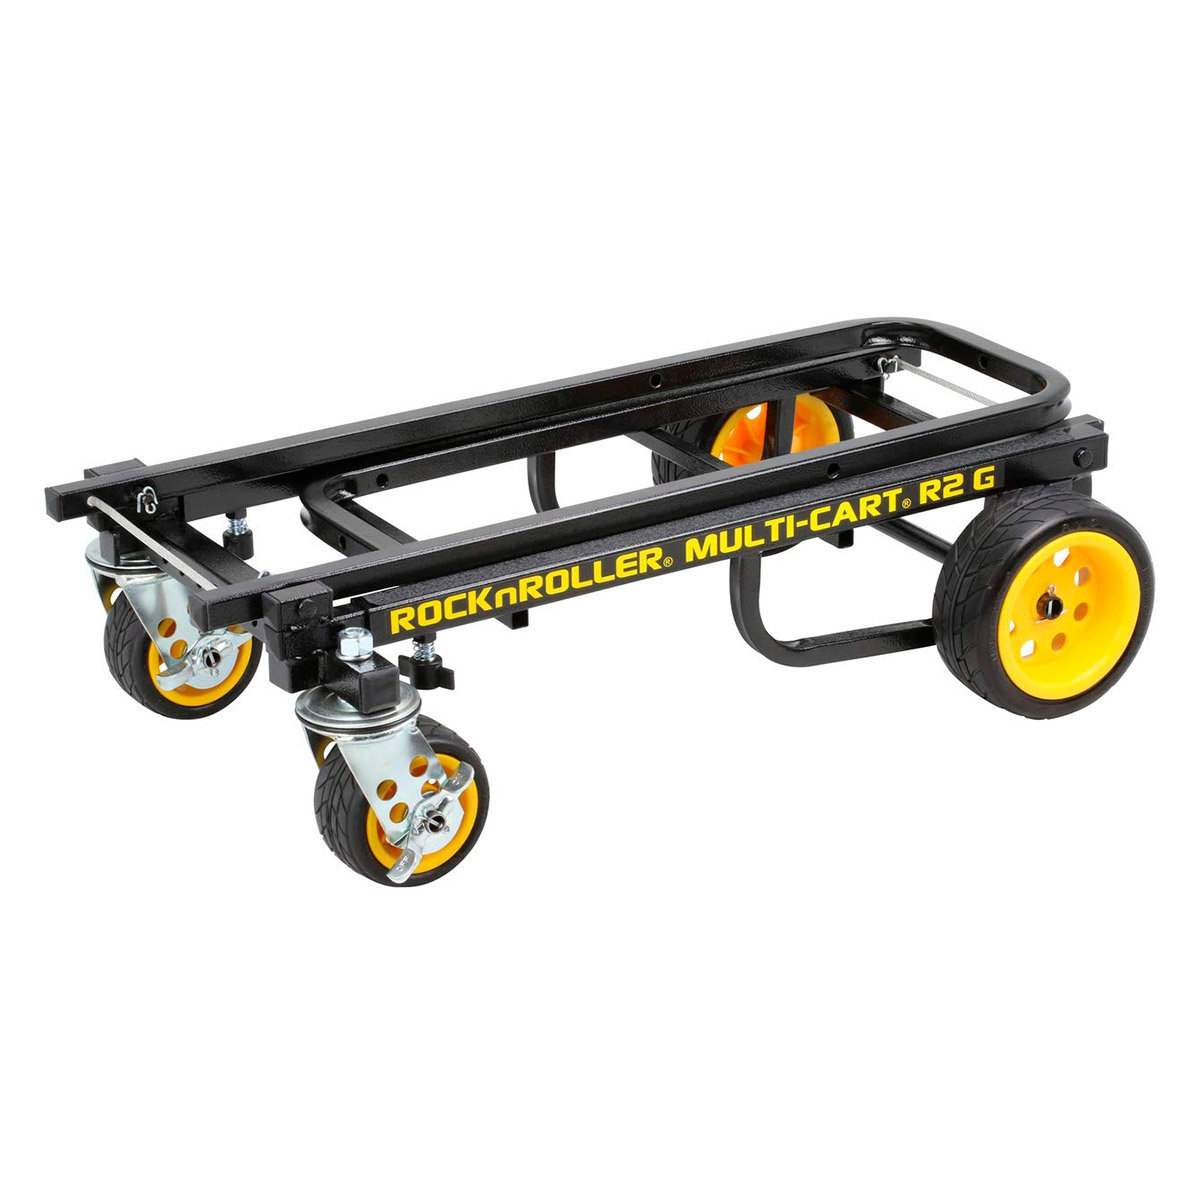 Chariot R2G - RockNRoller